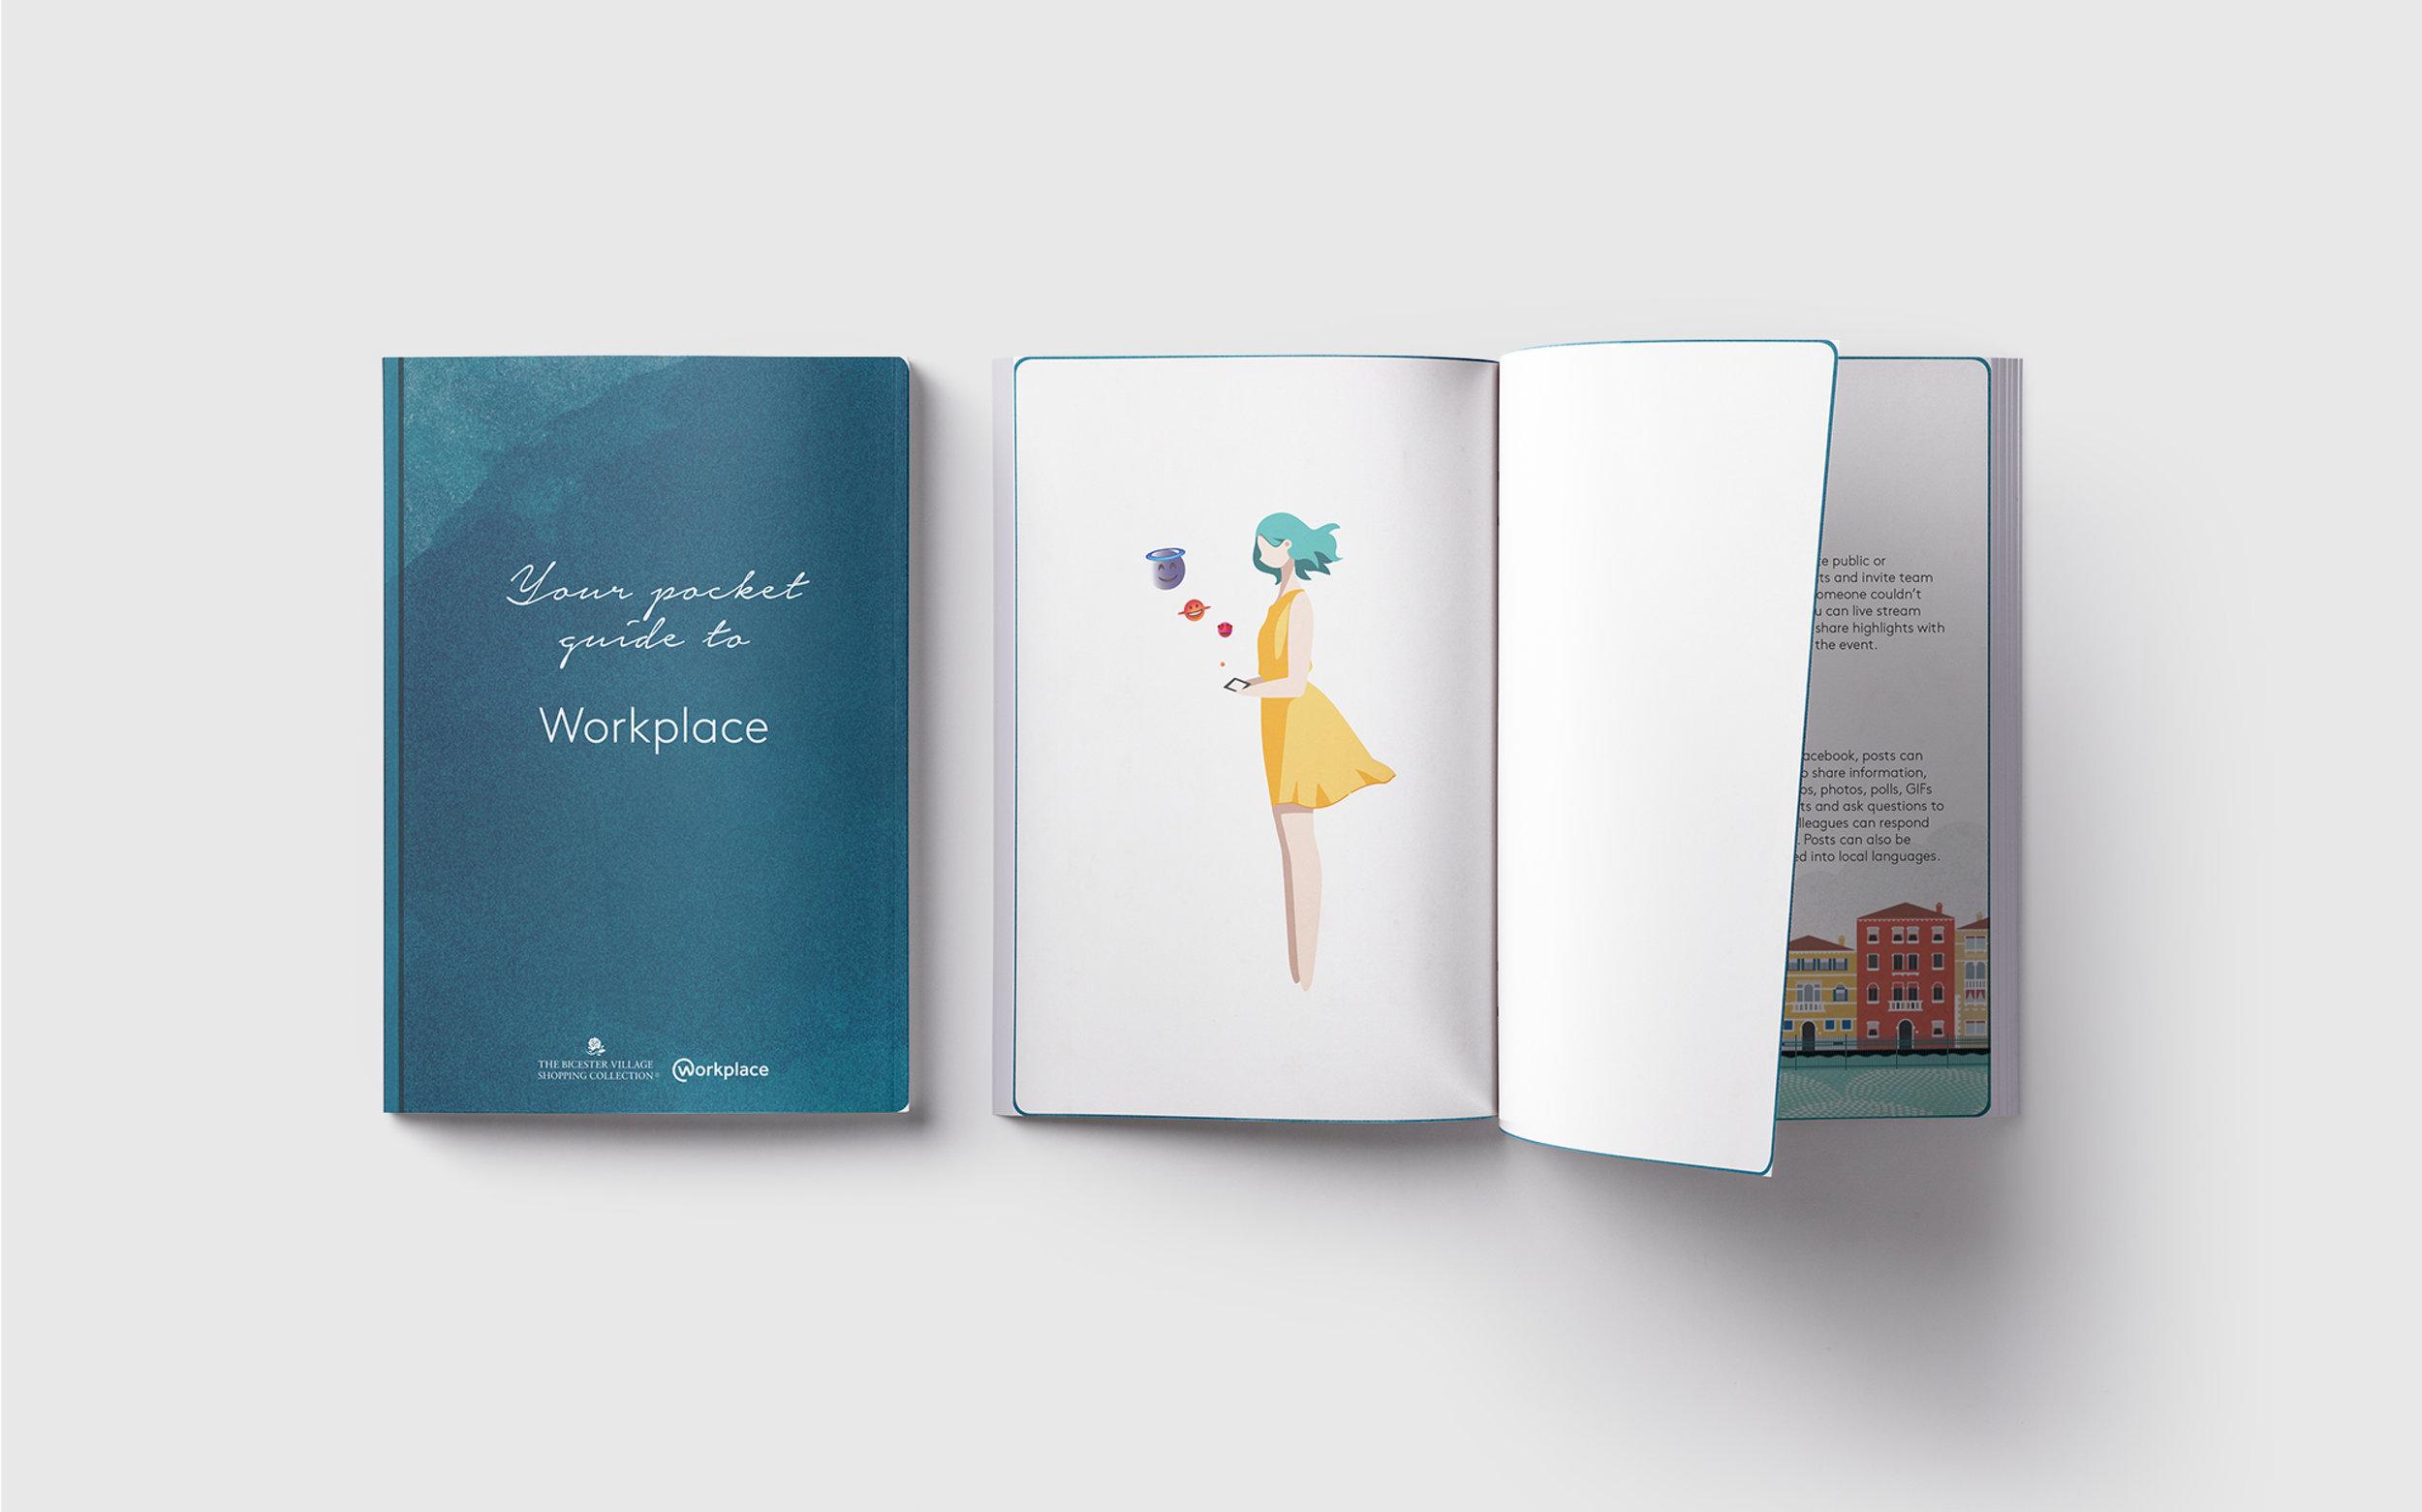 KuiperDesign-Workplace1